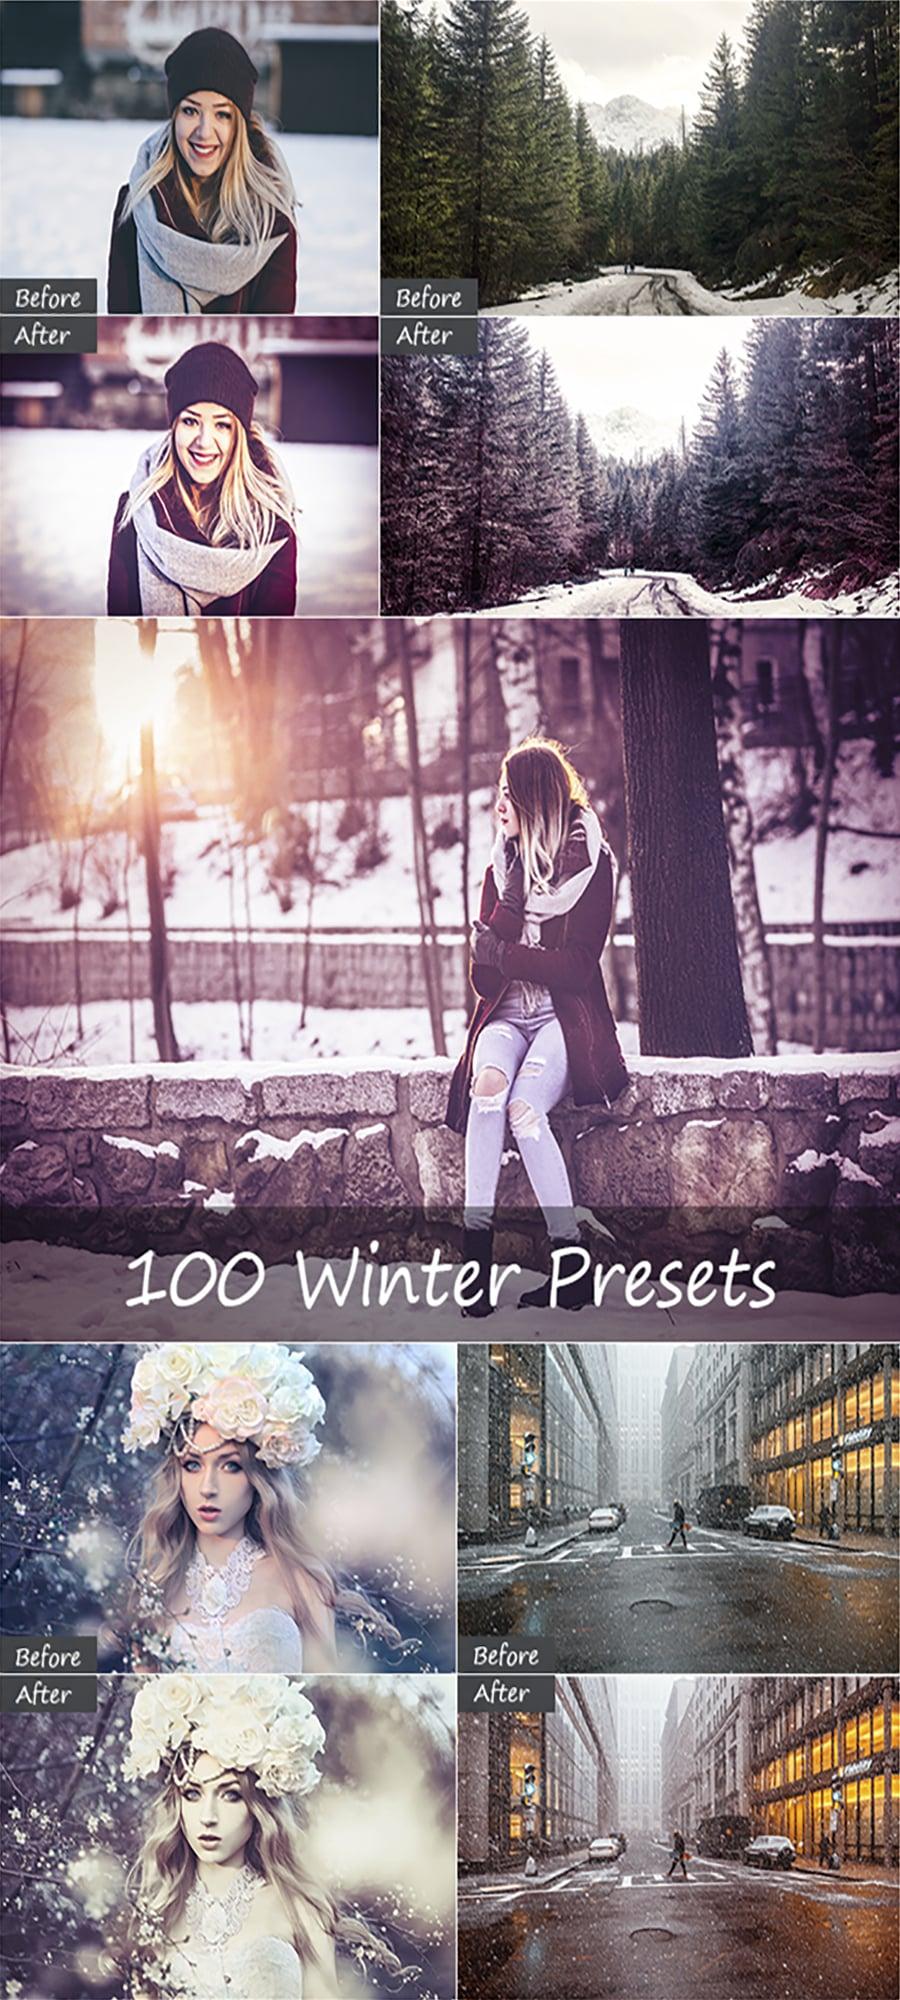 100 Winter Lightroom Presets - Full Image 900x2000px